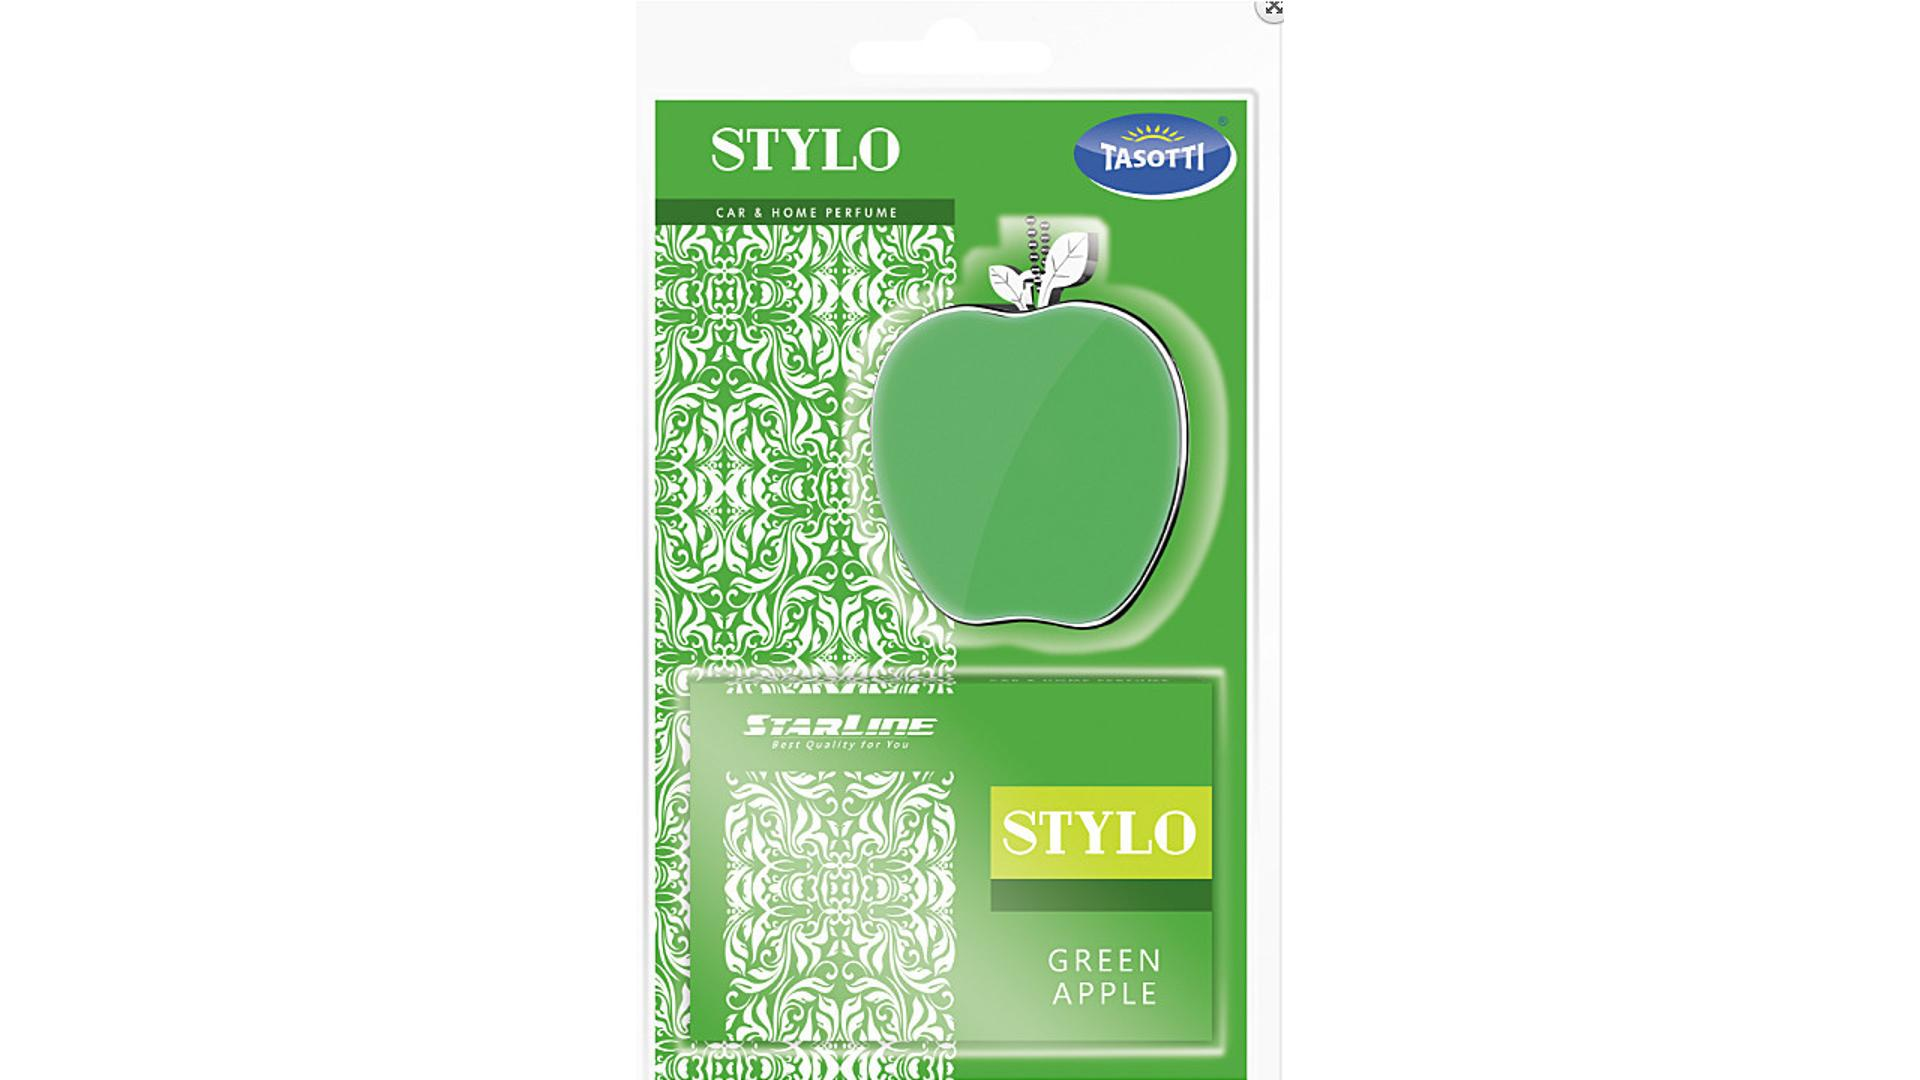 TASOTTI Stylo green apple